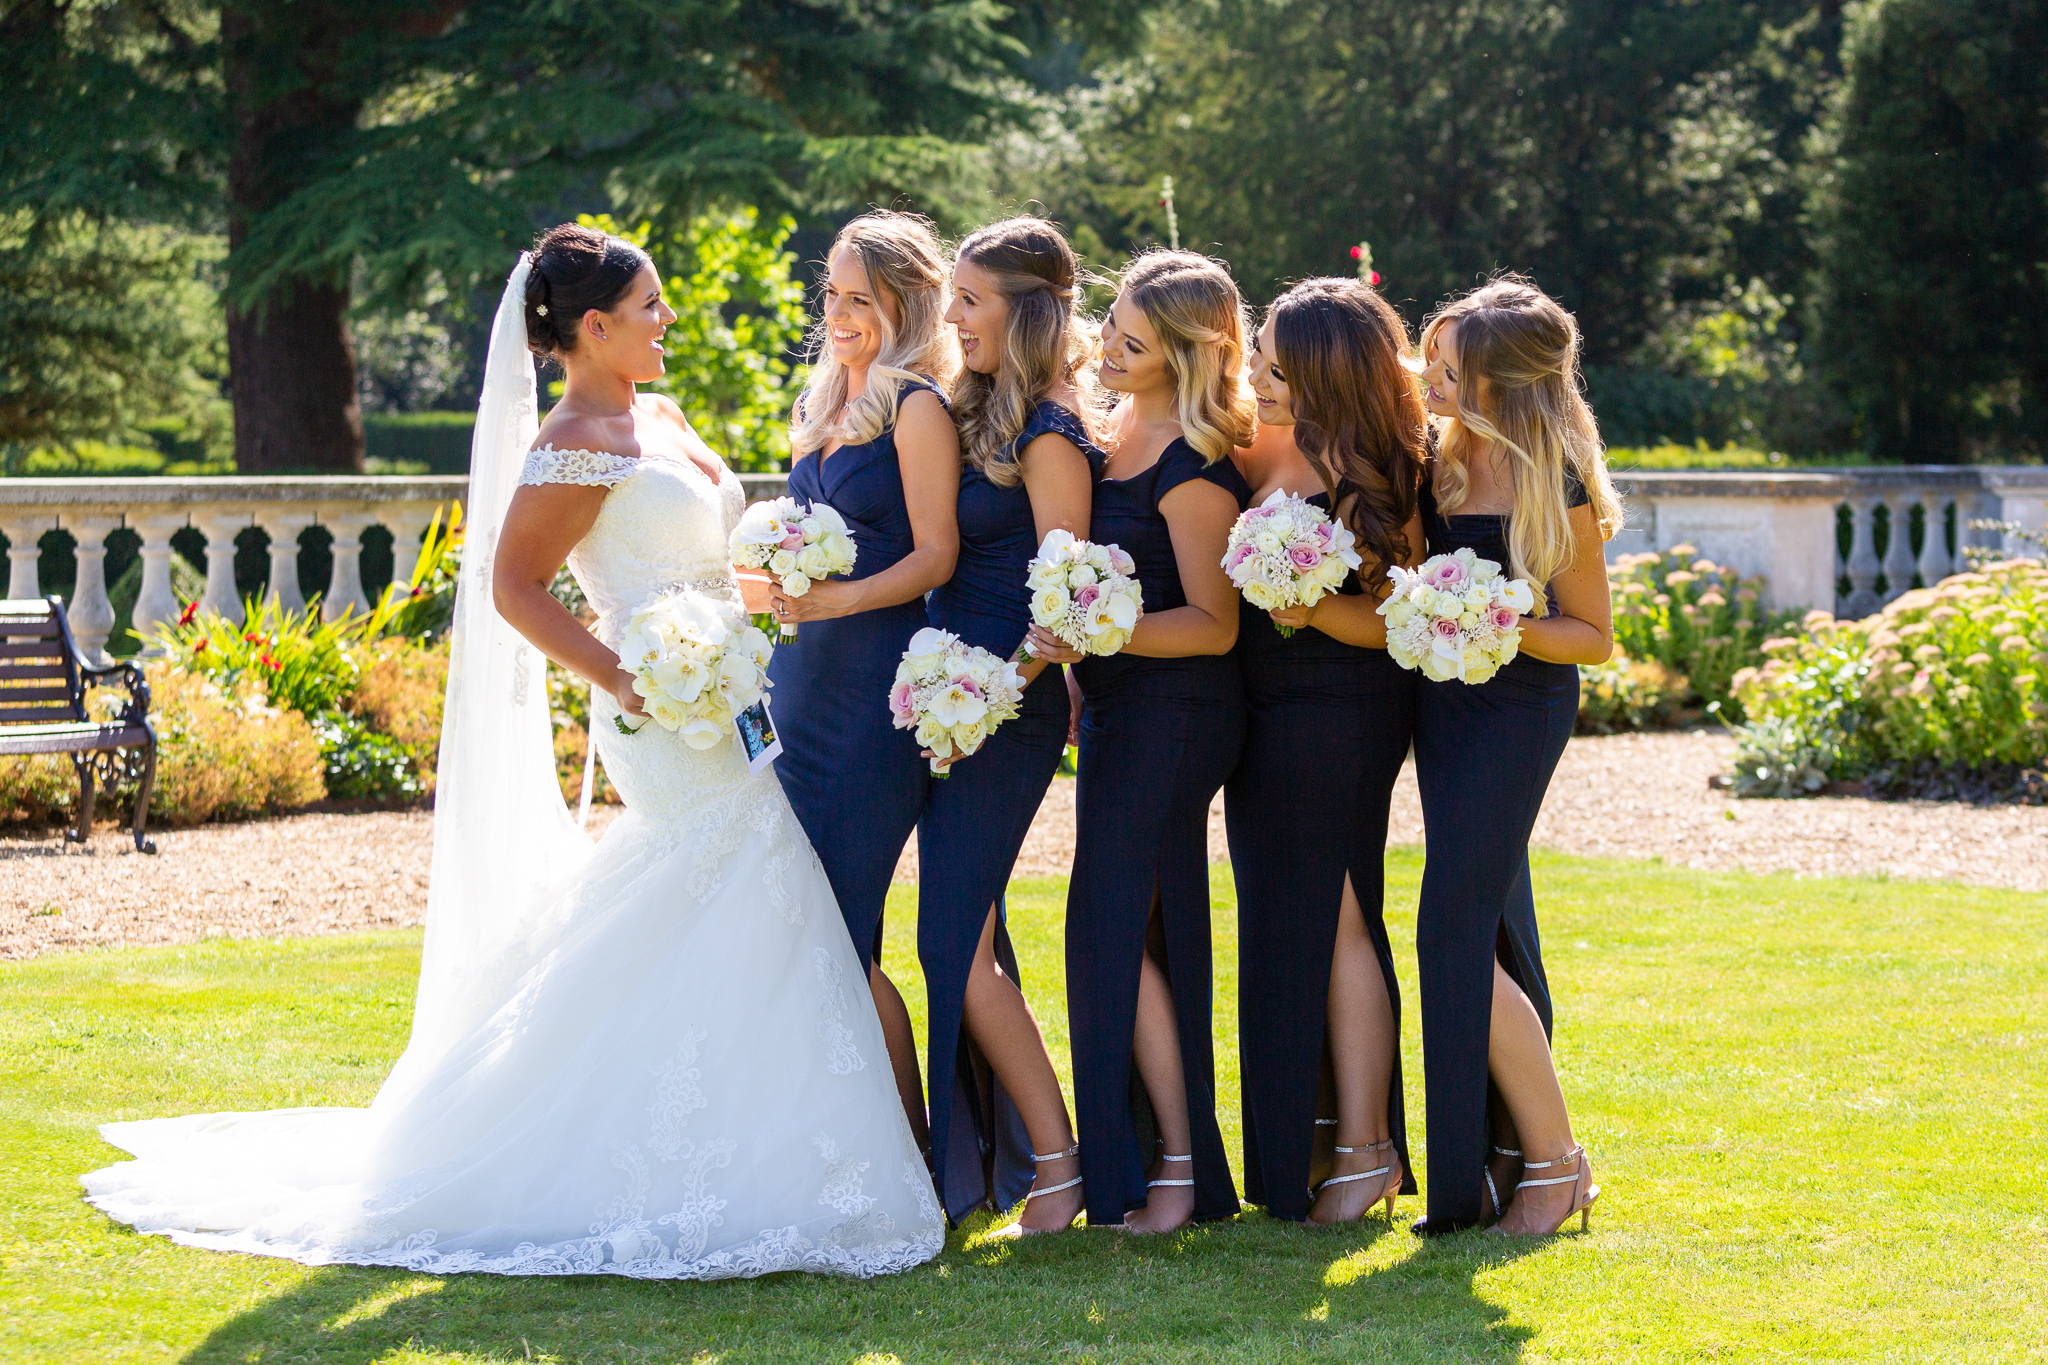 Bride_Bridesmaids_fun_natural_wedding_photography_Rachel_Thornhill_Photographer